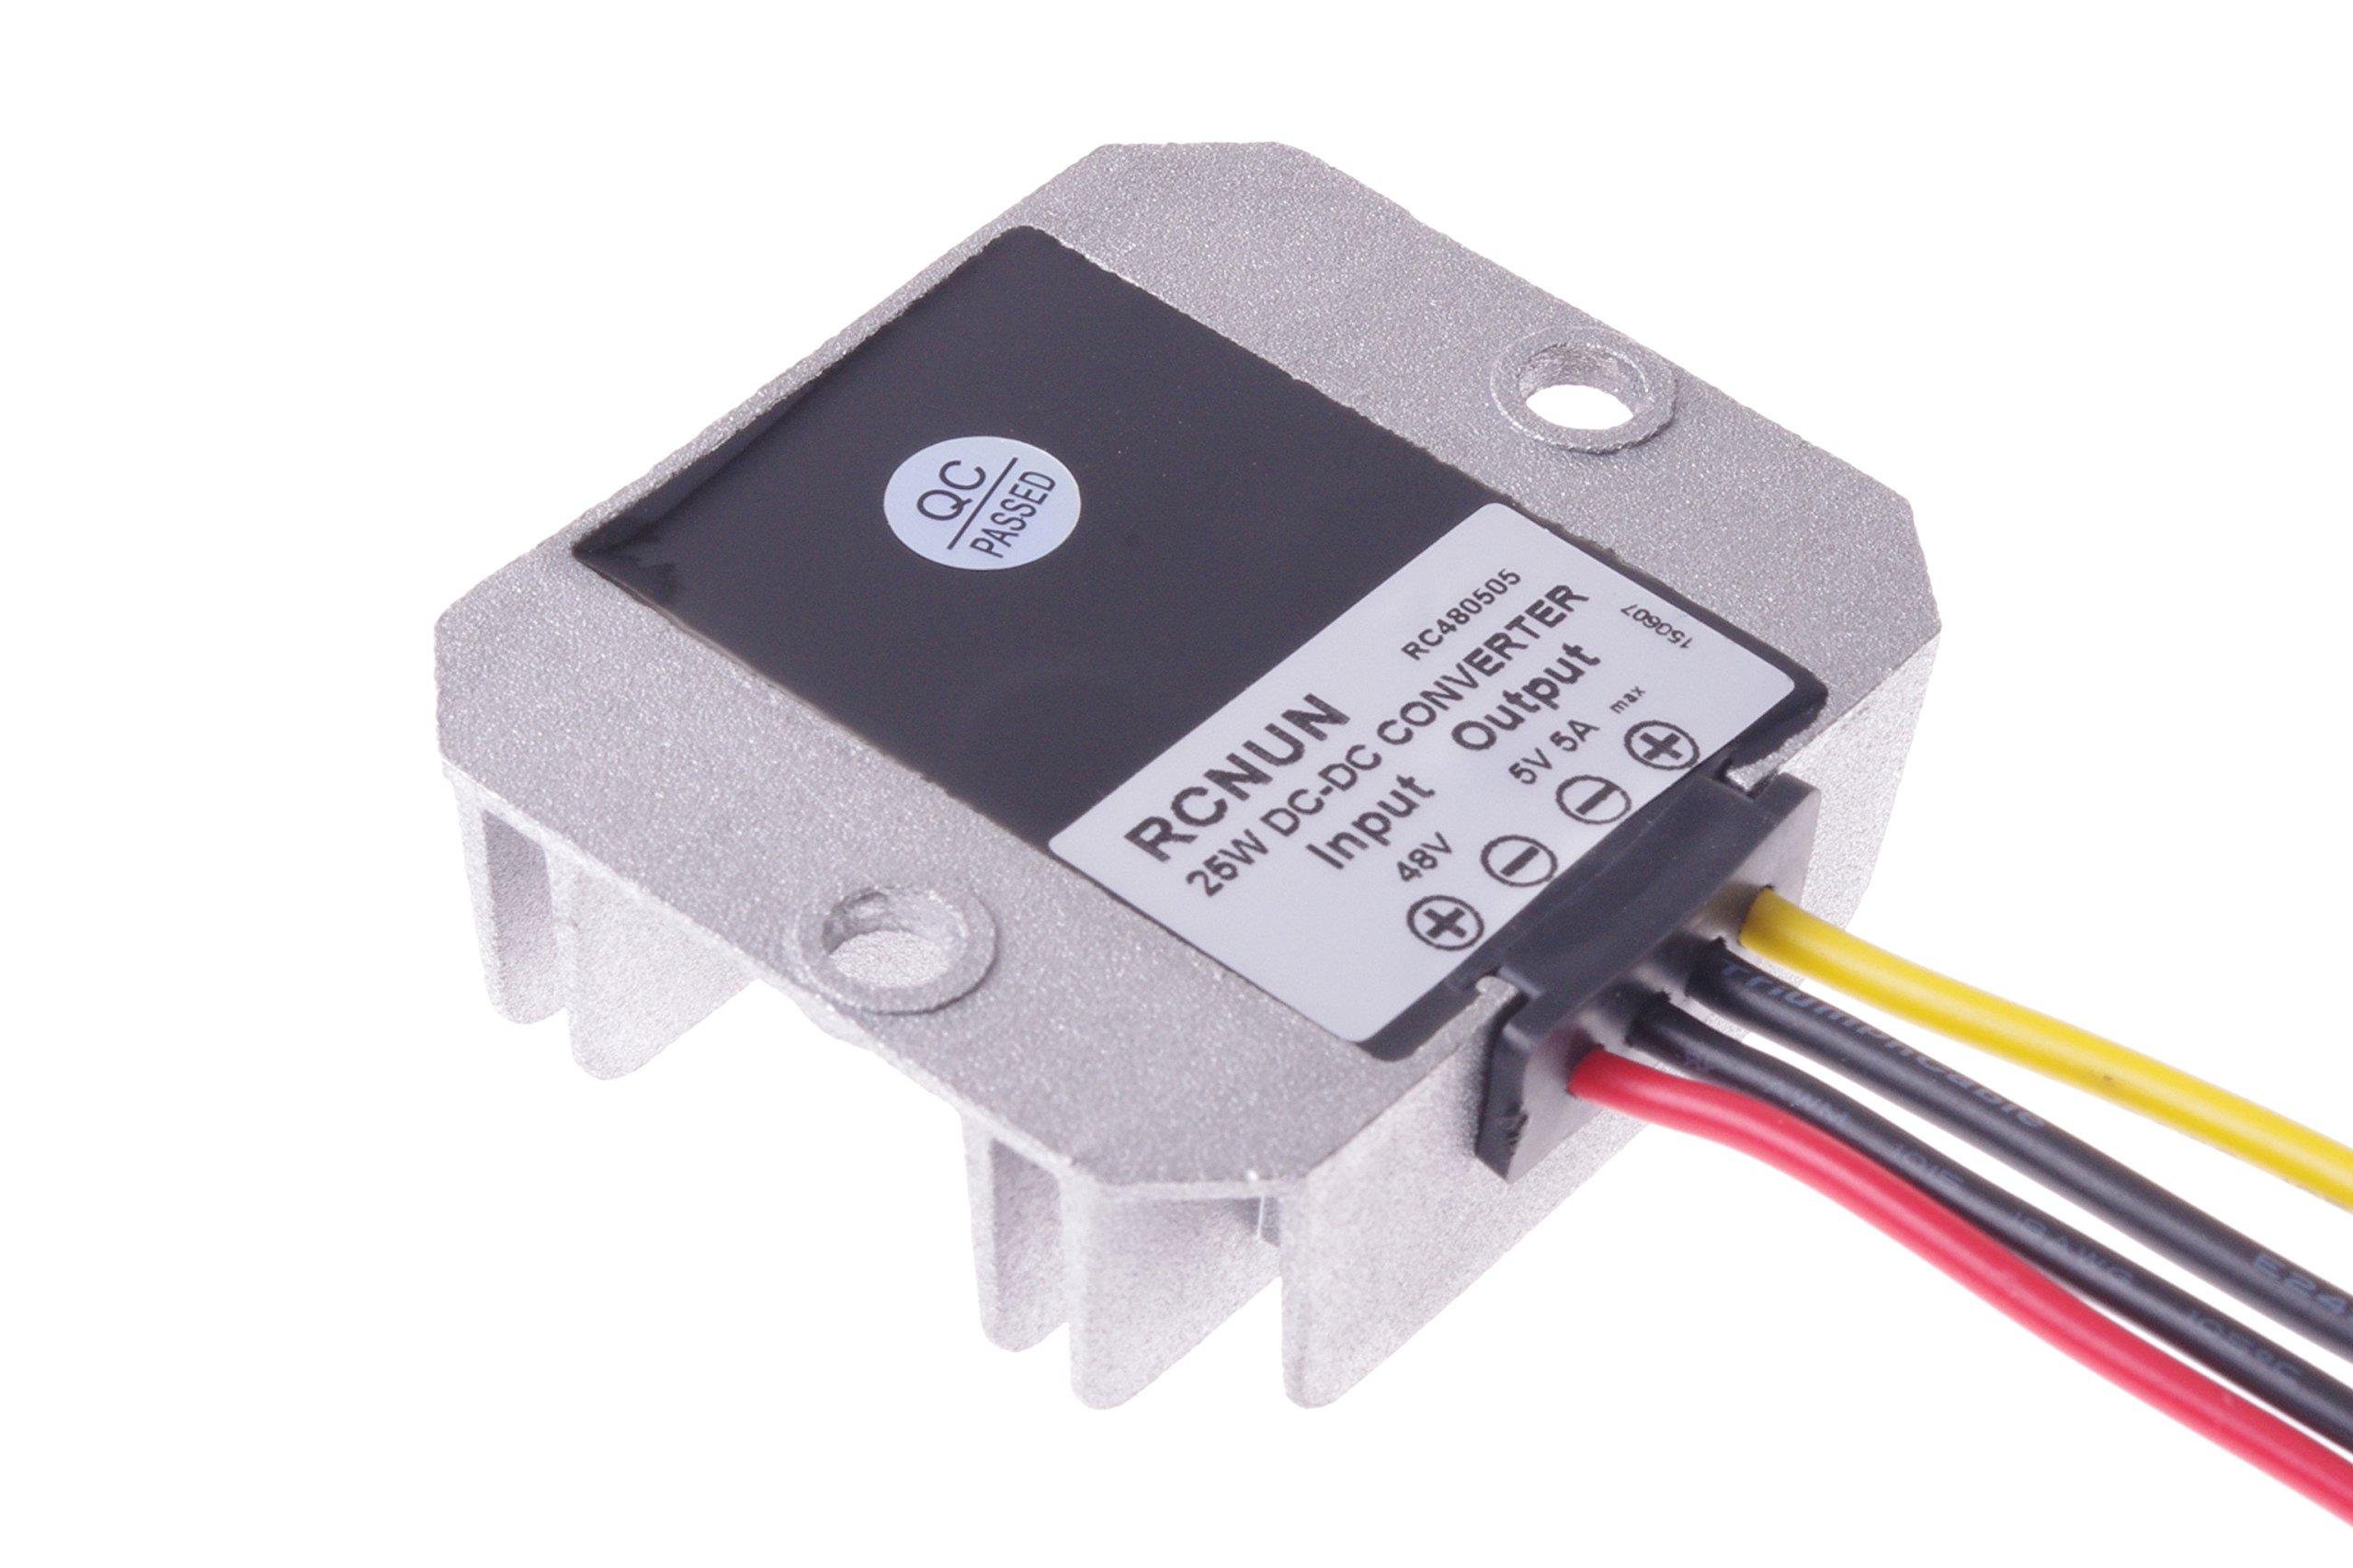 SMAKN® DC-DC Voltage Step-Down Converter Buck Module 12V/24V/36V/48V to 5V 5A 25W Car LED power converter Waterproof by SMAKN (Image #6)